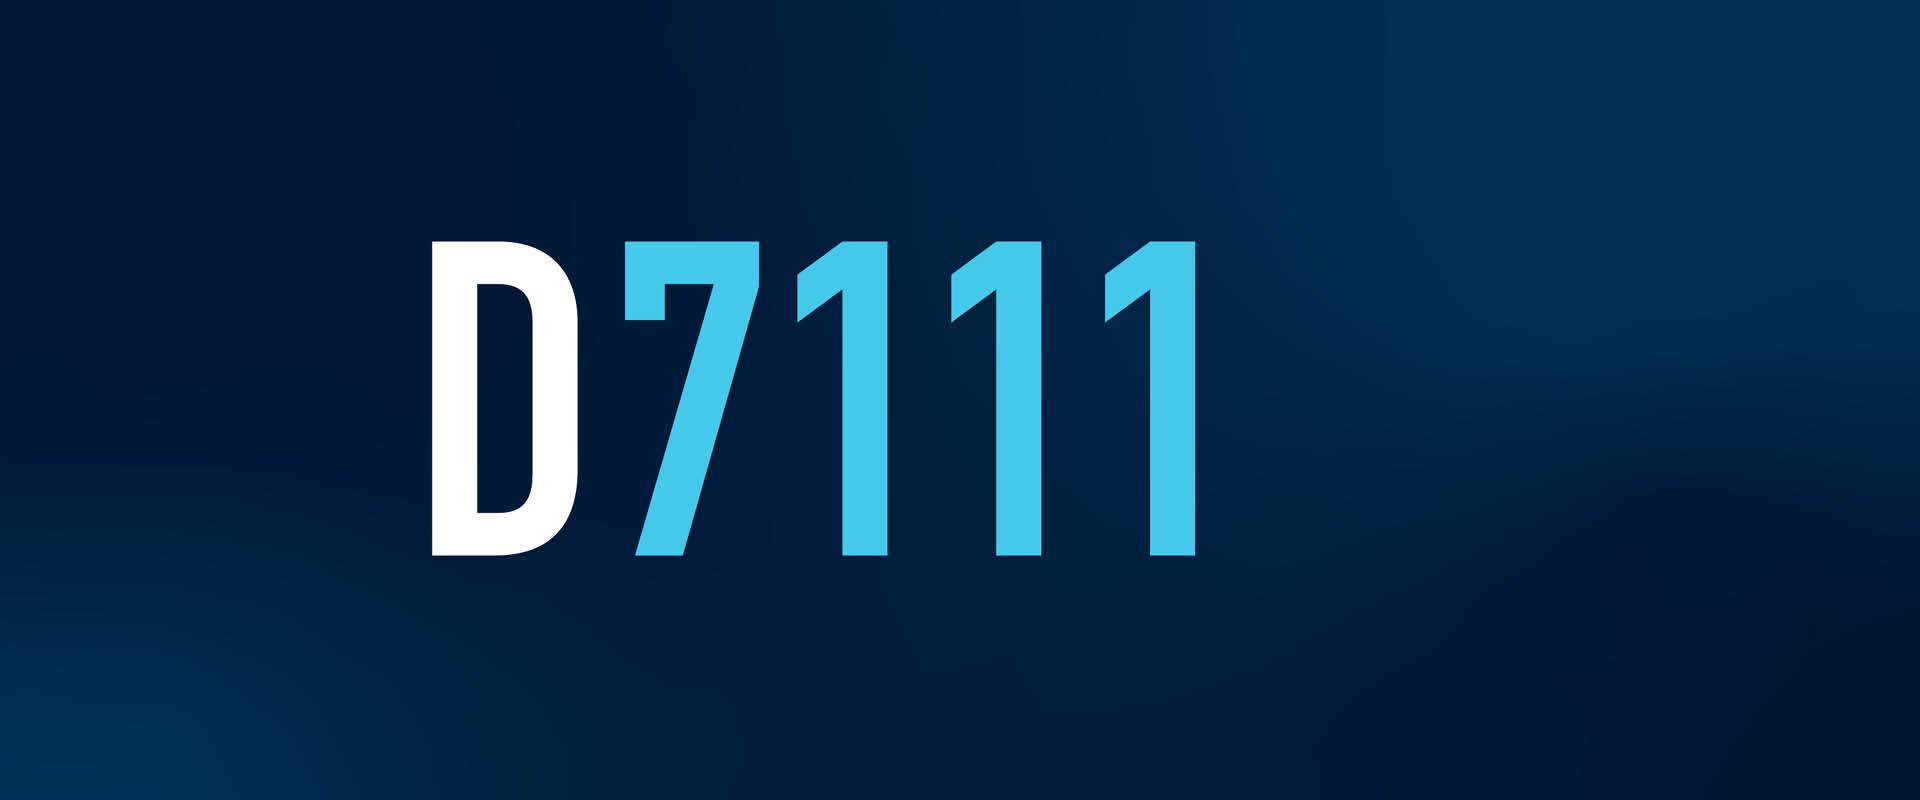 141 D7111